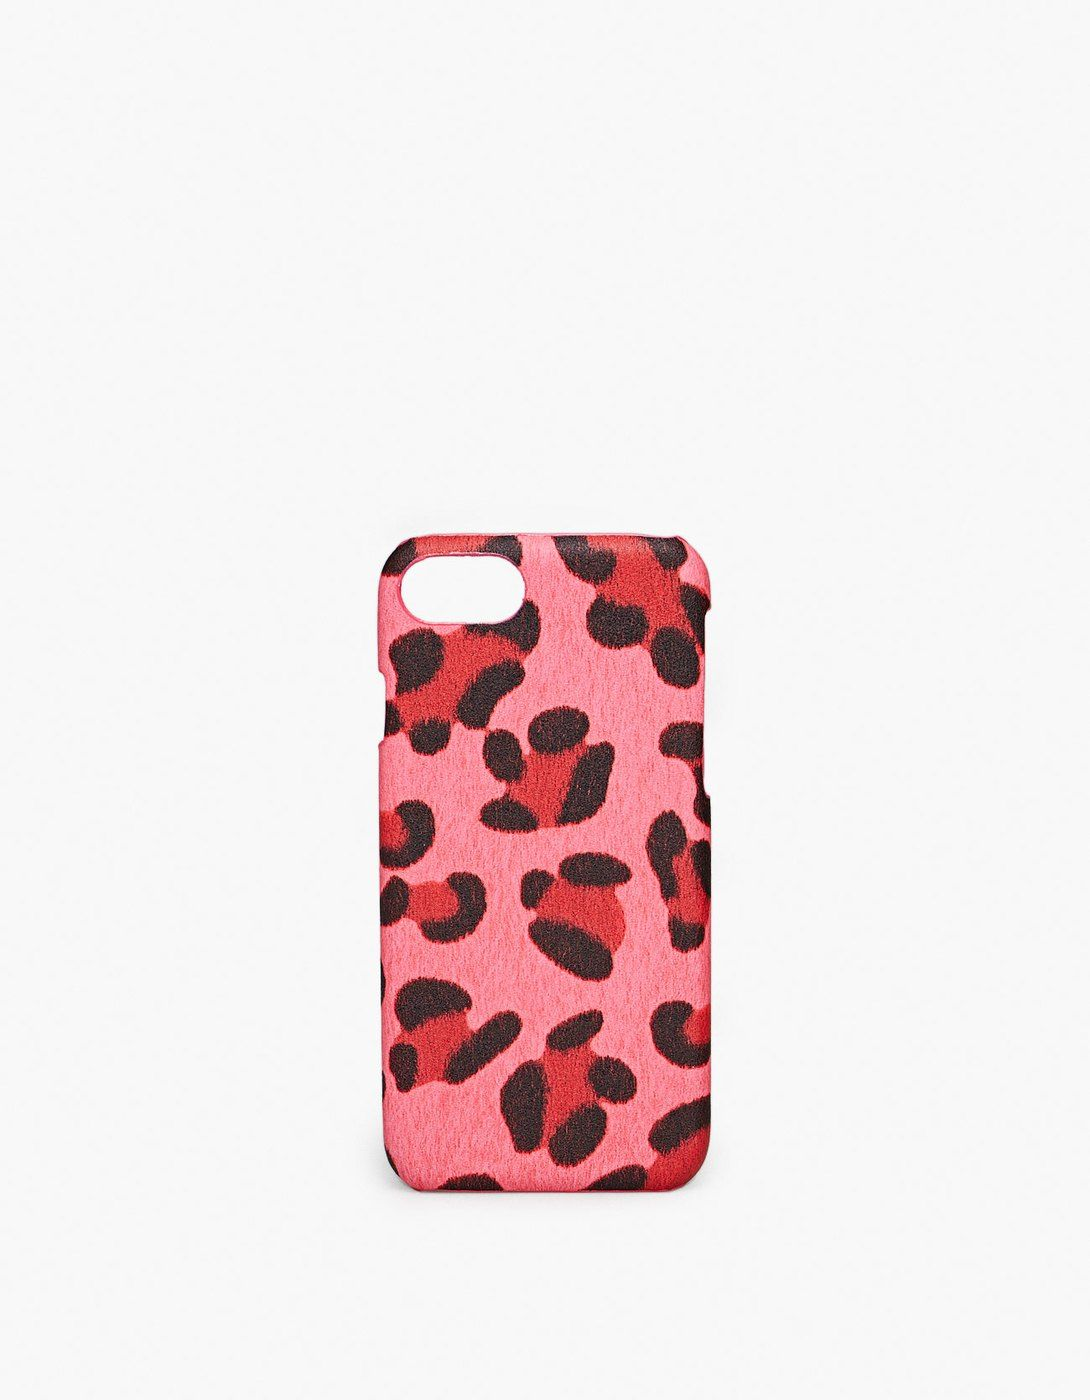 8ad6fd35ac2 Funda móvil leopardo rosa Iphone 6/7/8 - Otros | Stradivarius España ...